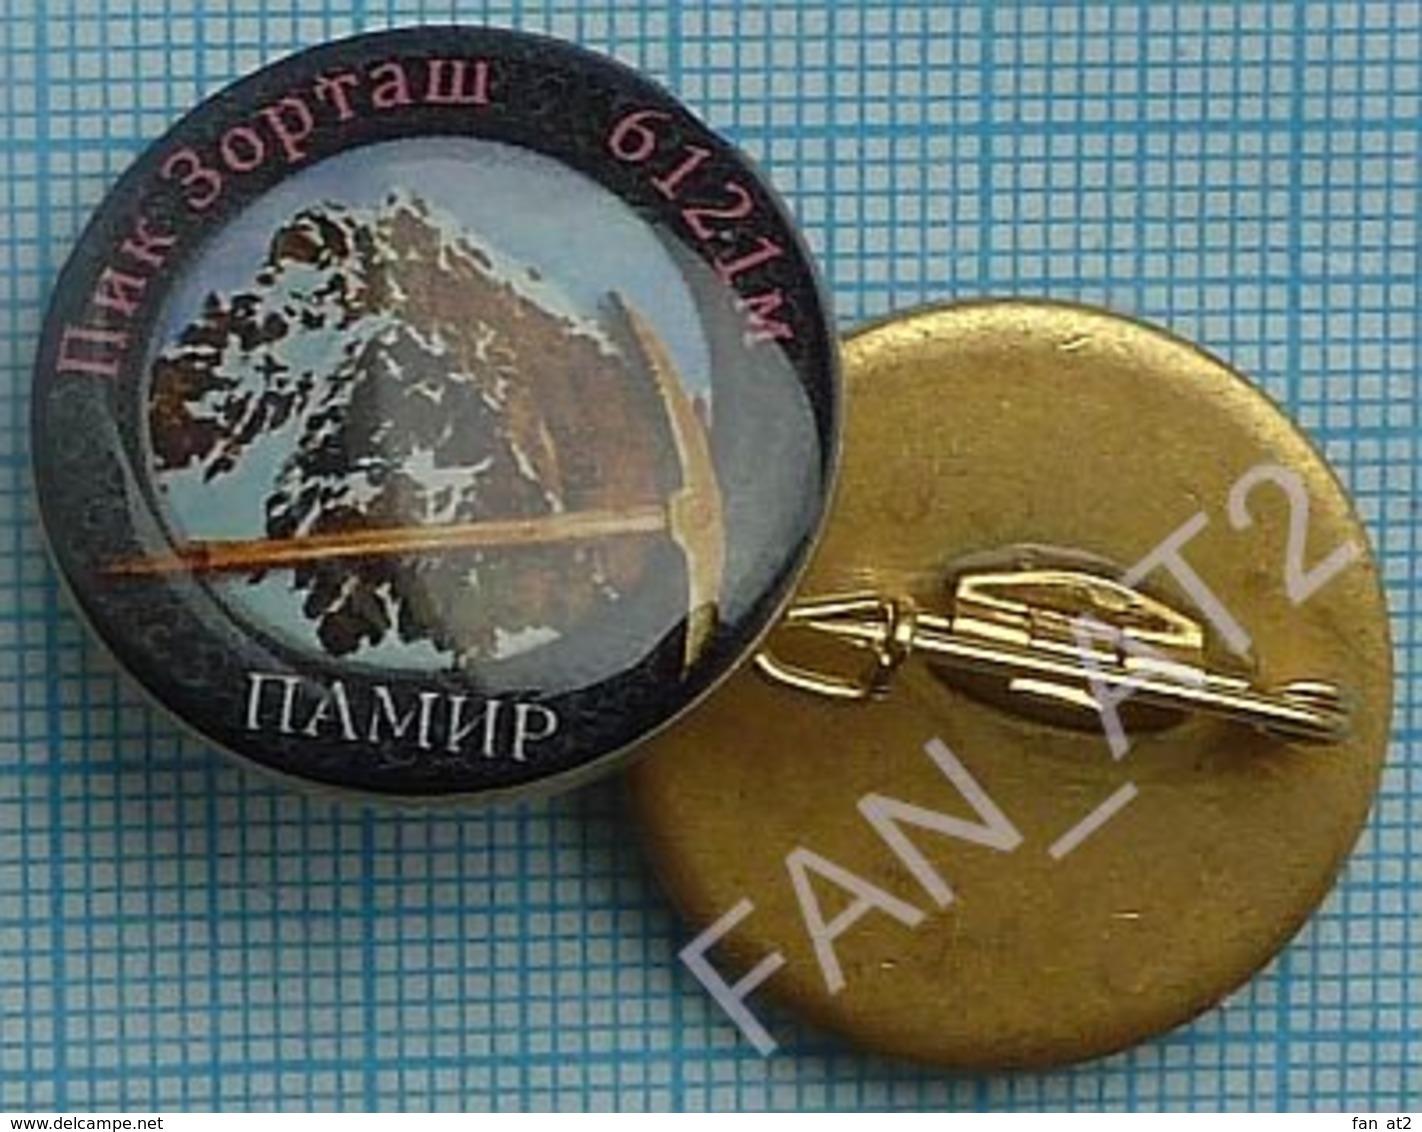 UKRAINE / Badge / Alpinism Tourism Mountaineering Tourism. Pamir.  Zortaş Peak 2010s - Alpinism, Mountaineering